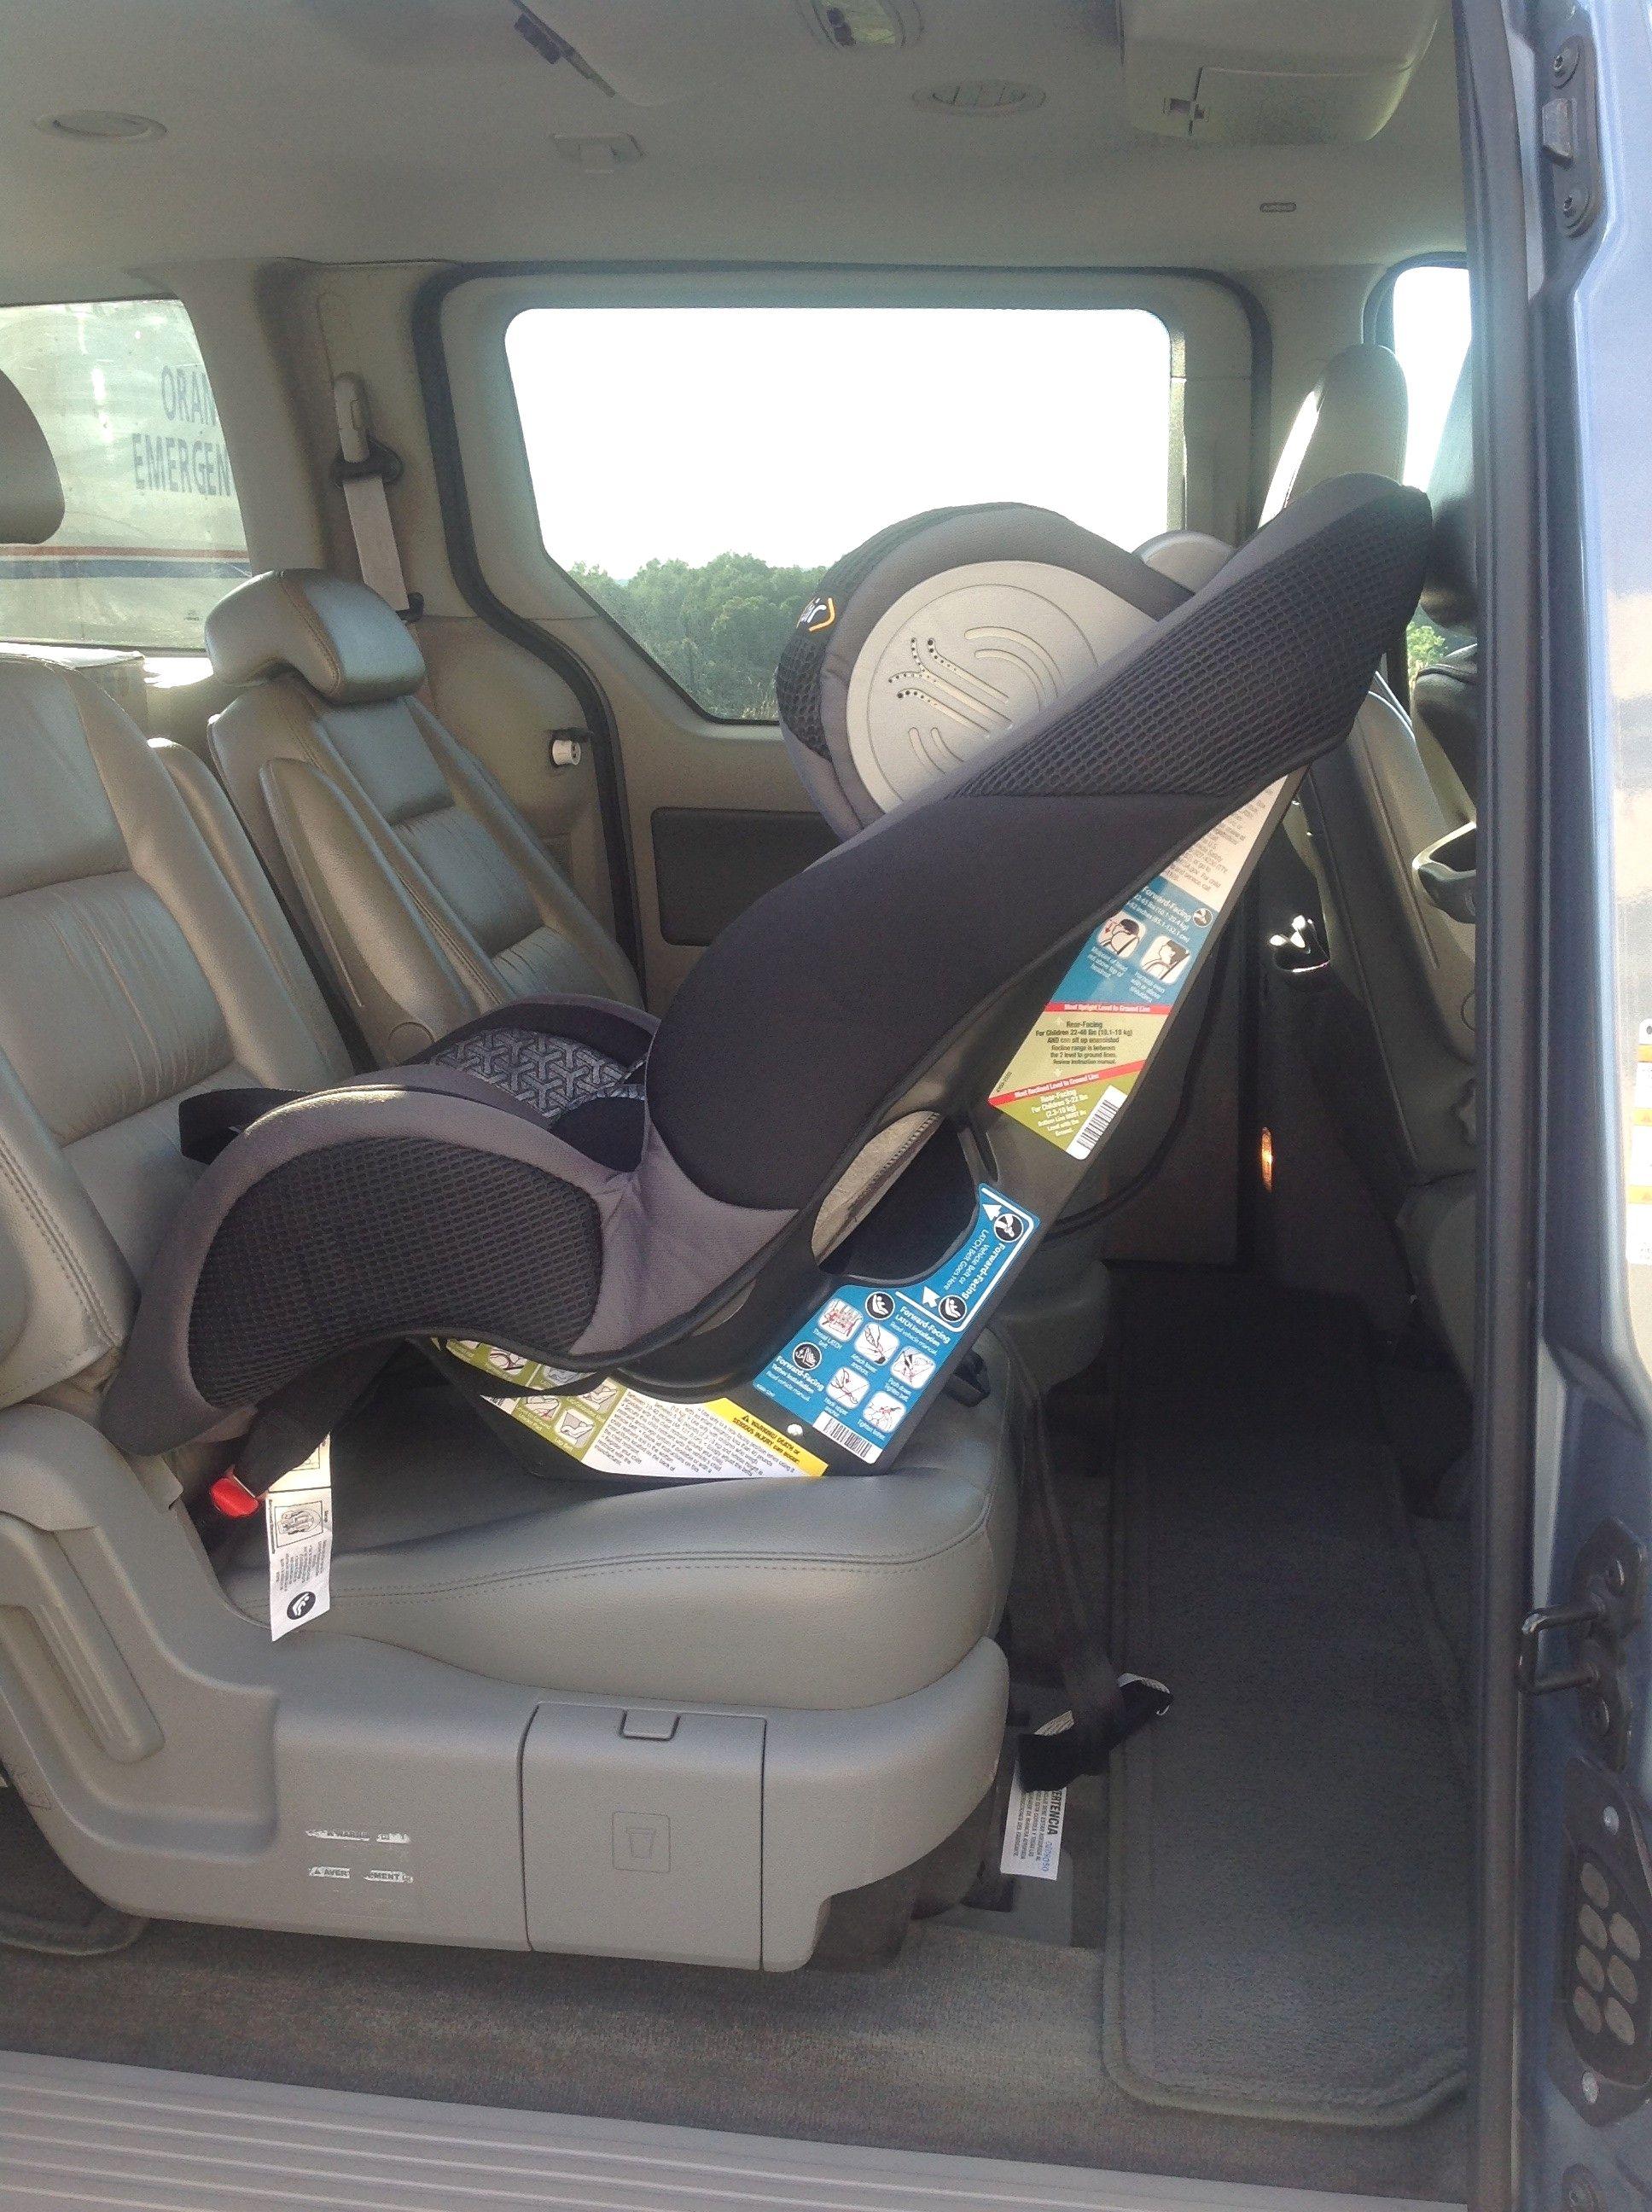 Pin By Nana Semonick On Car Seat Pinterest Car Seats Baby Car